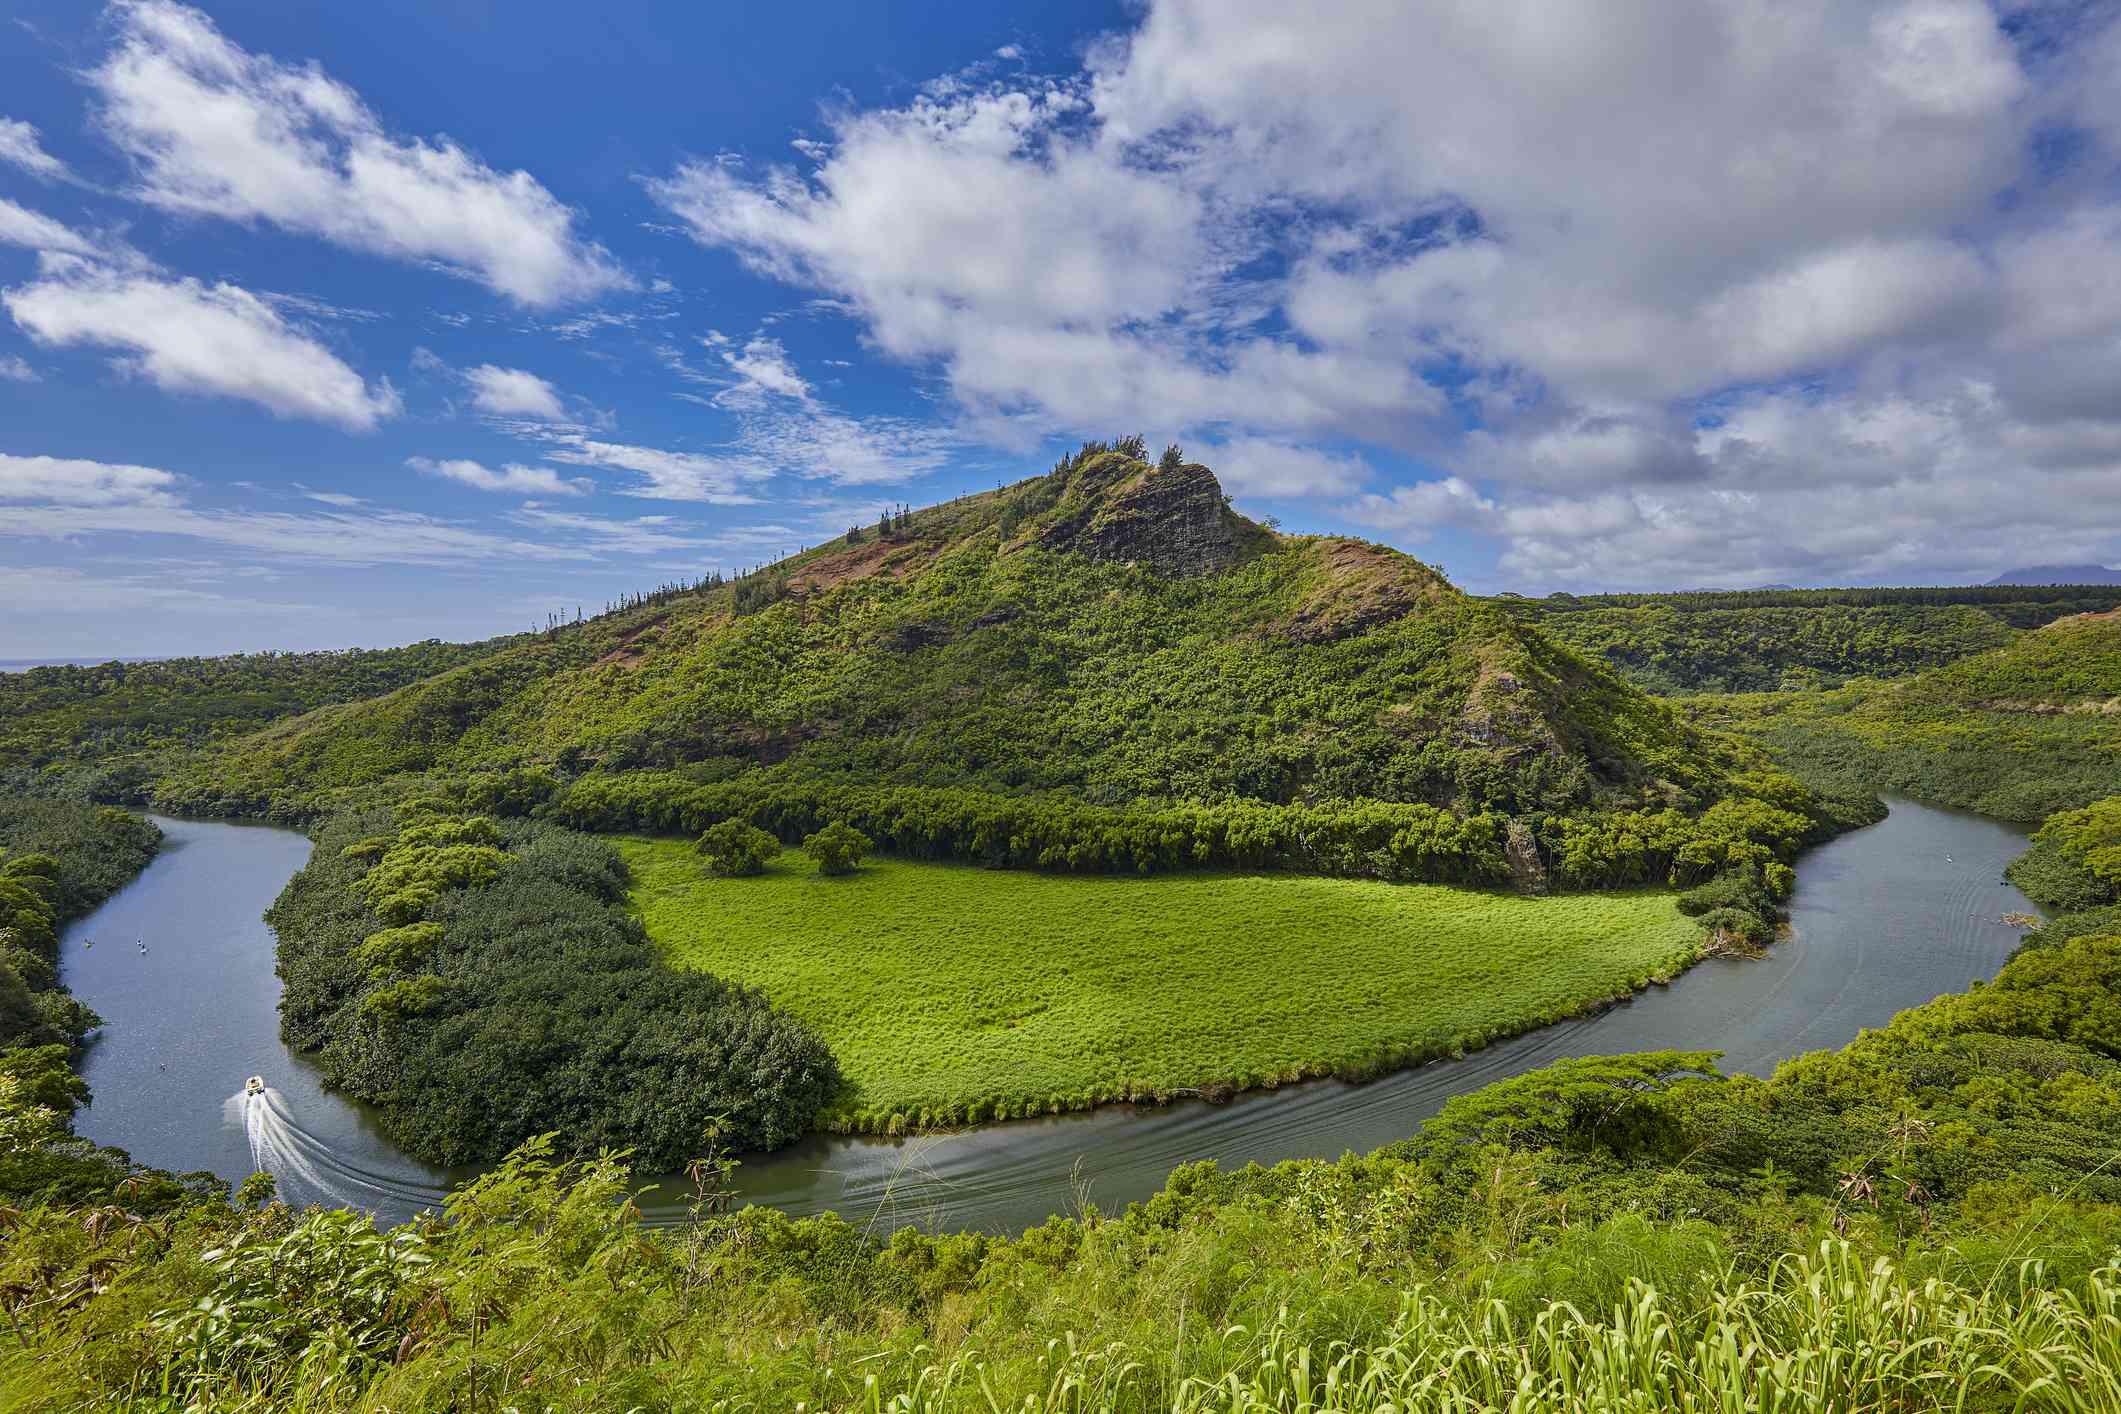 Wailua River winds around open grassy area and small mountain